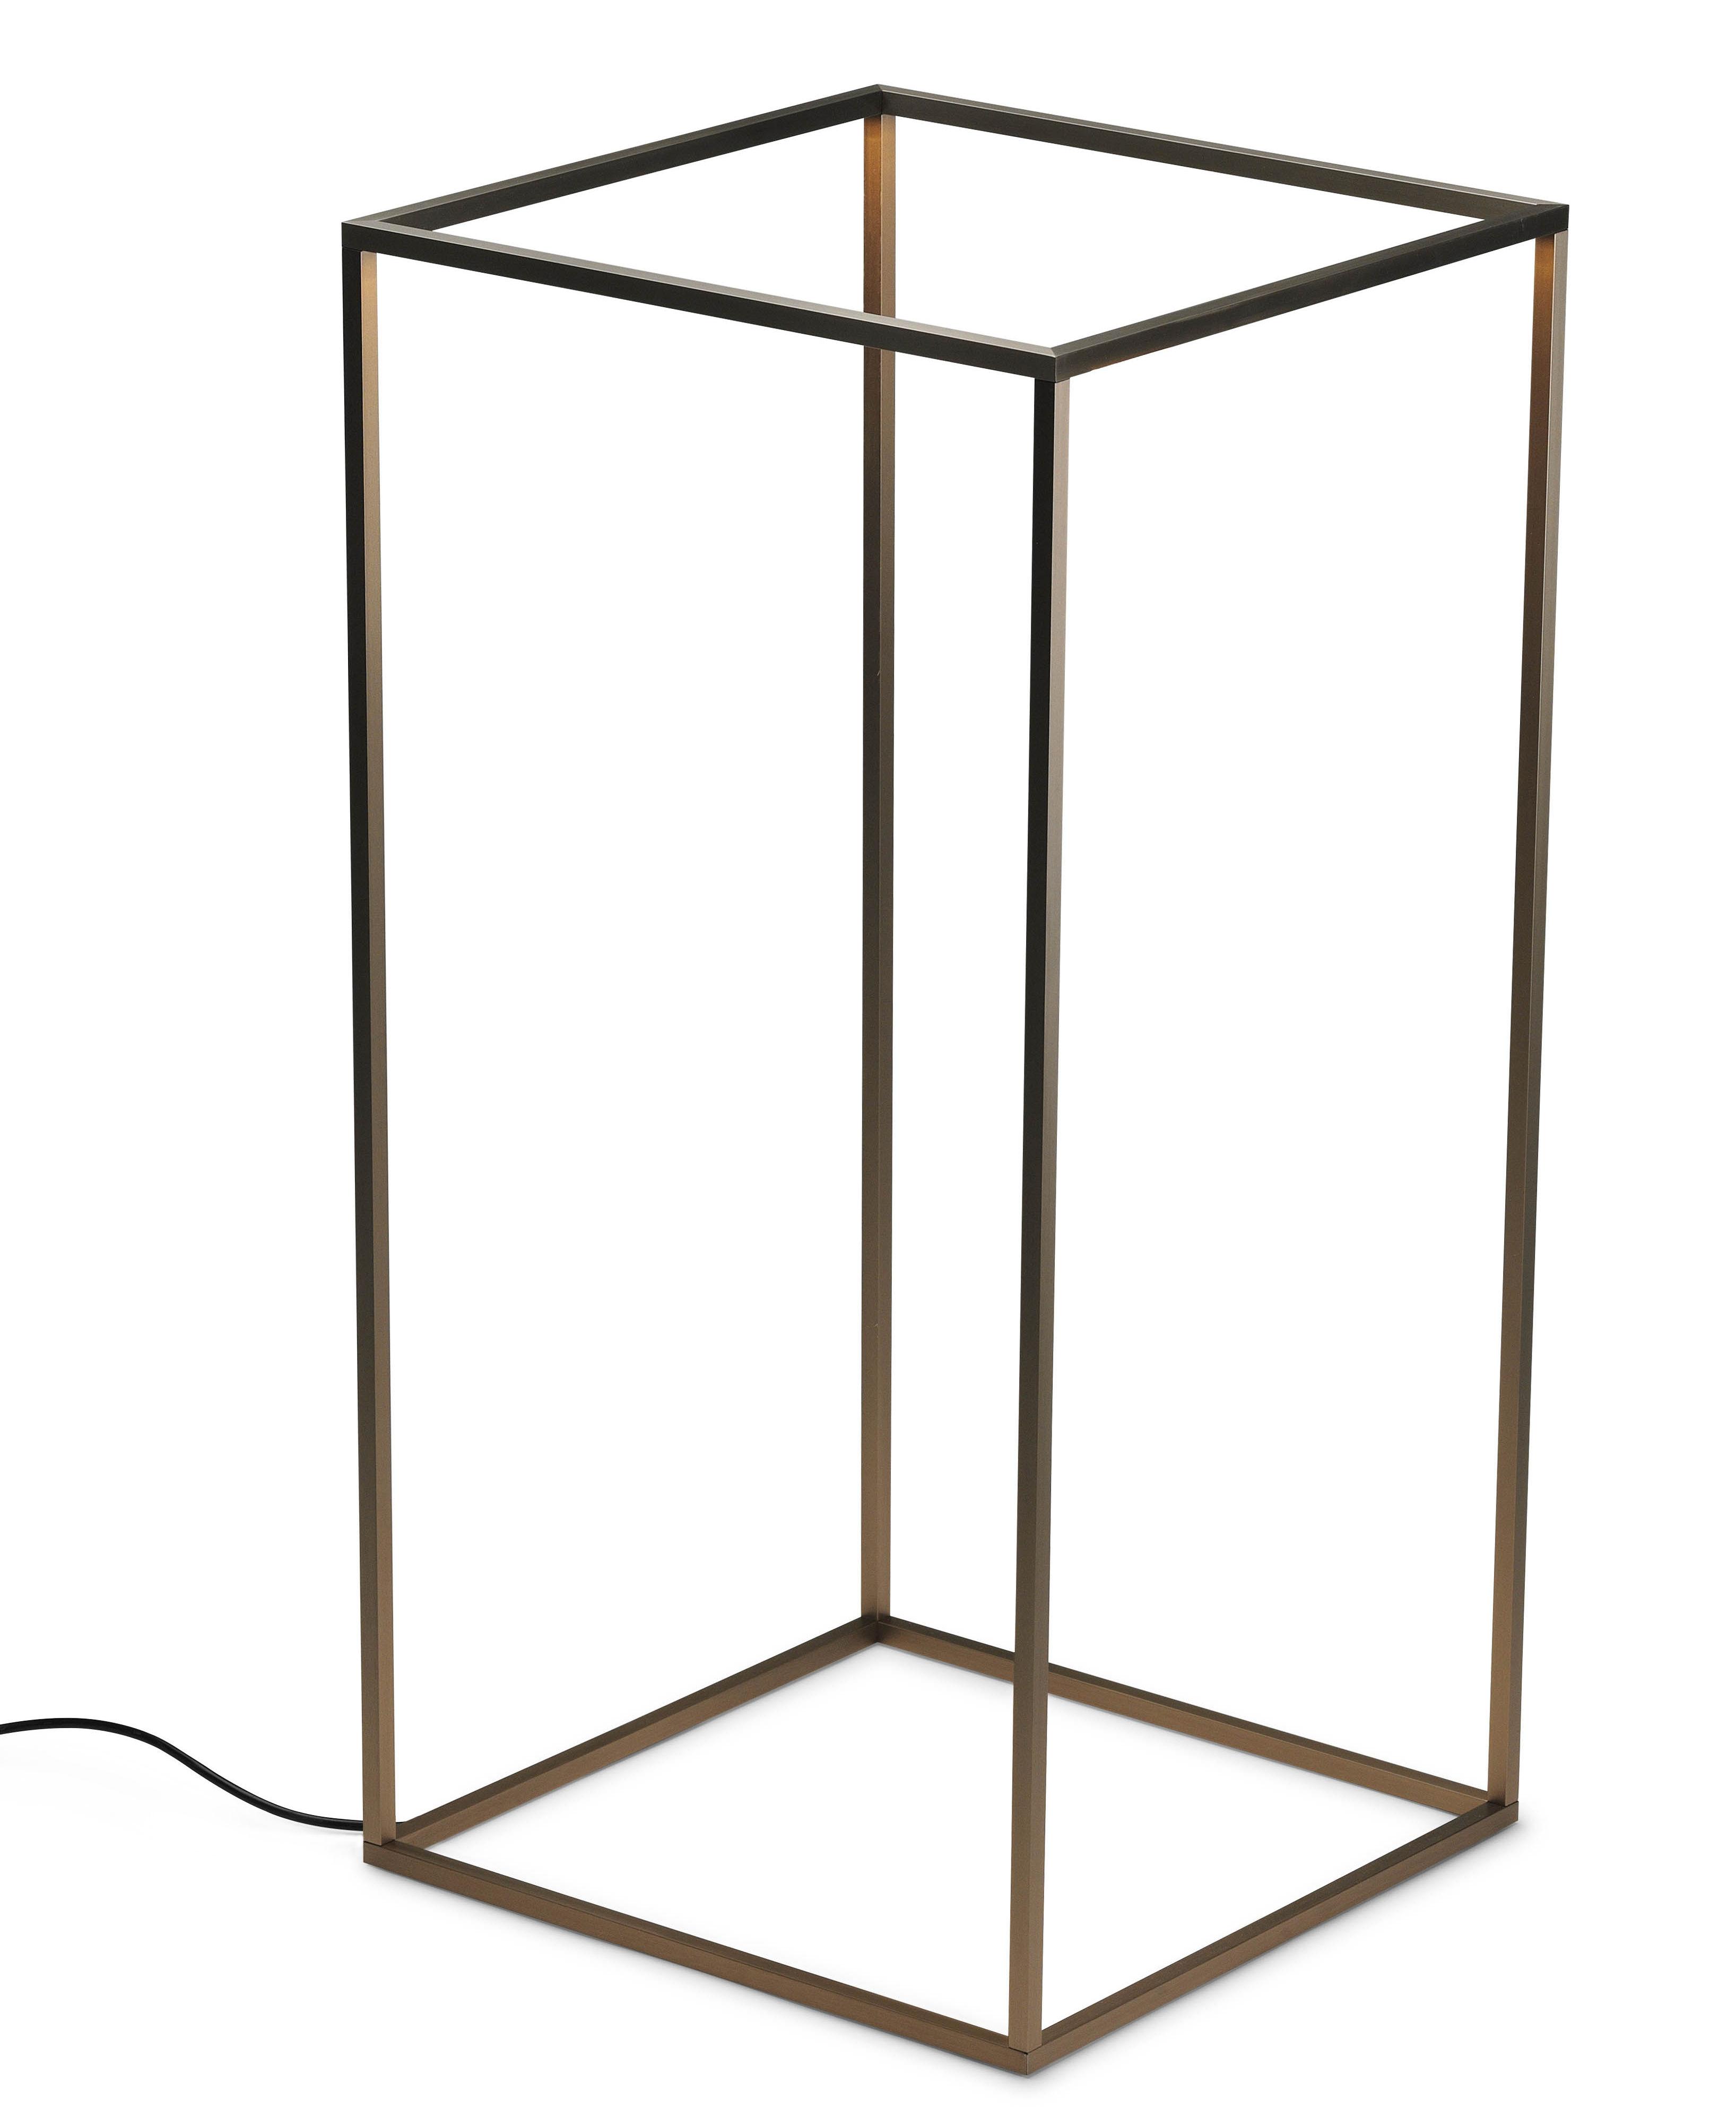 Lighting - Floor lamps - Ipnos Lamp by Flos - Brass - Extruded aluminium